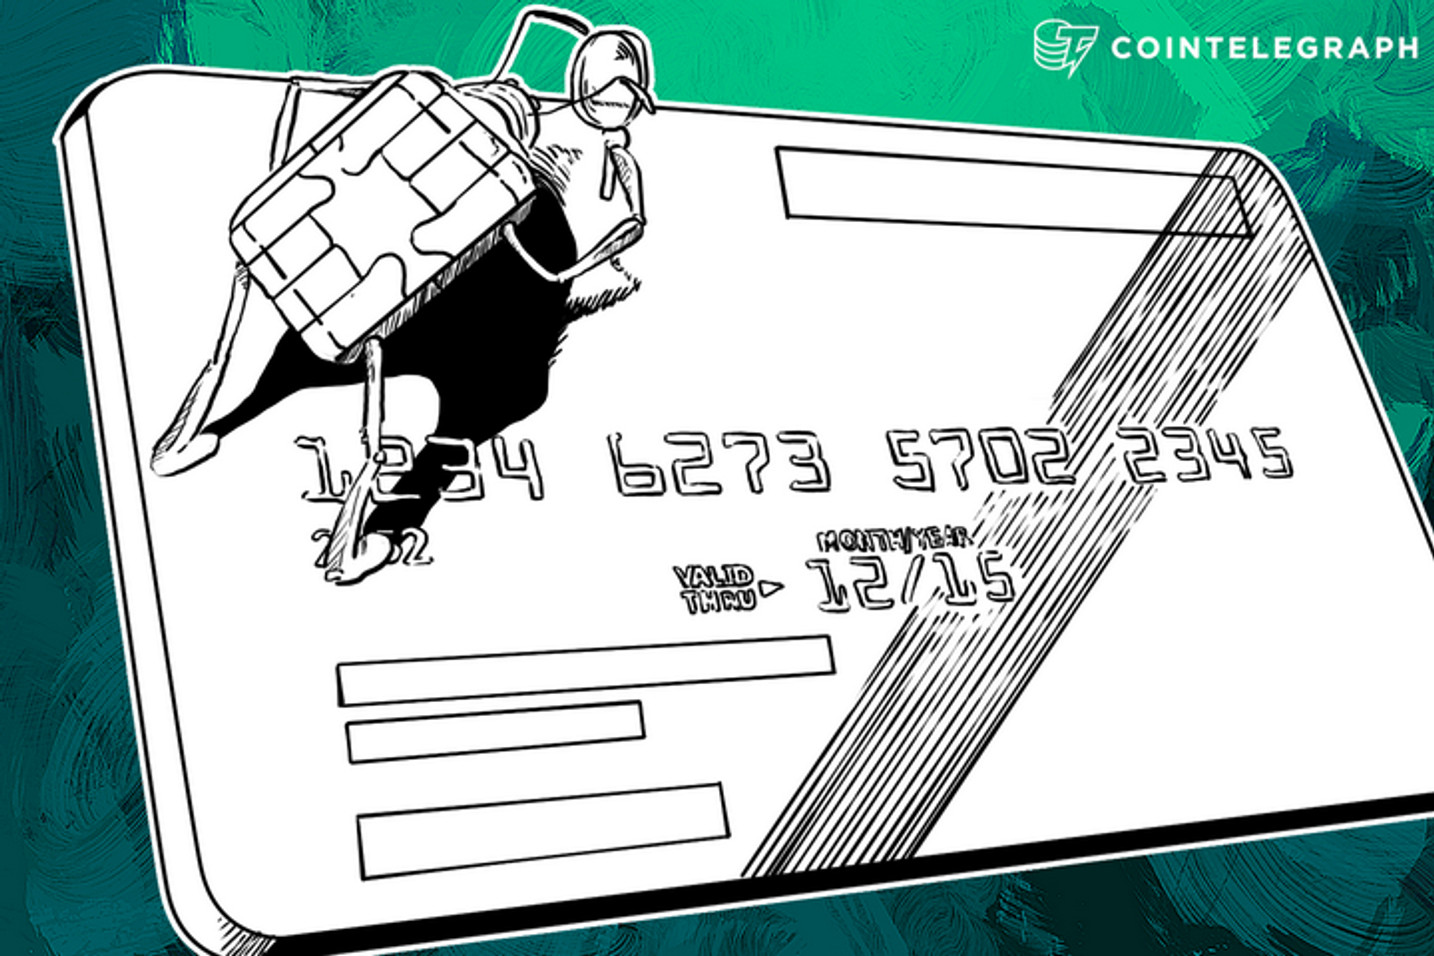 New Chip Cards May Actually Increase Credit Card Fraud, Hurt Merchants